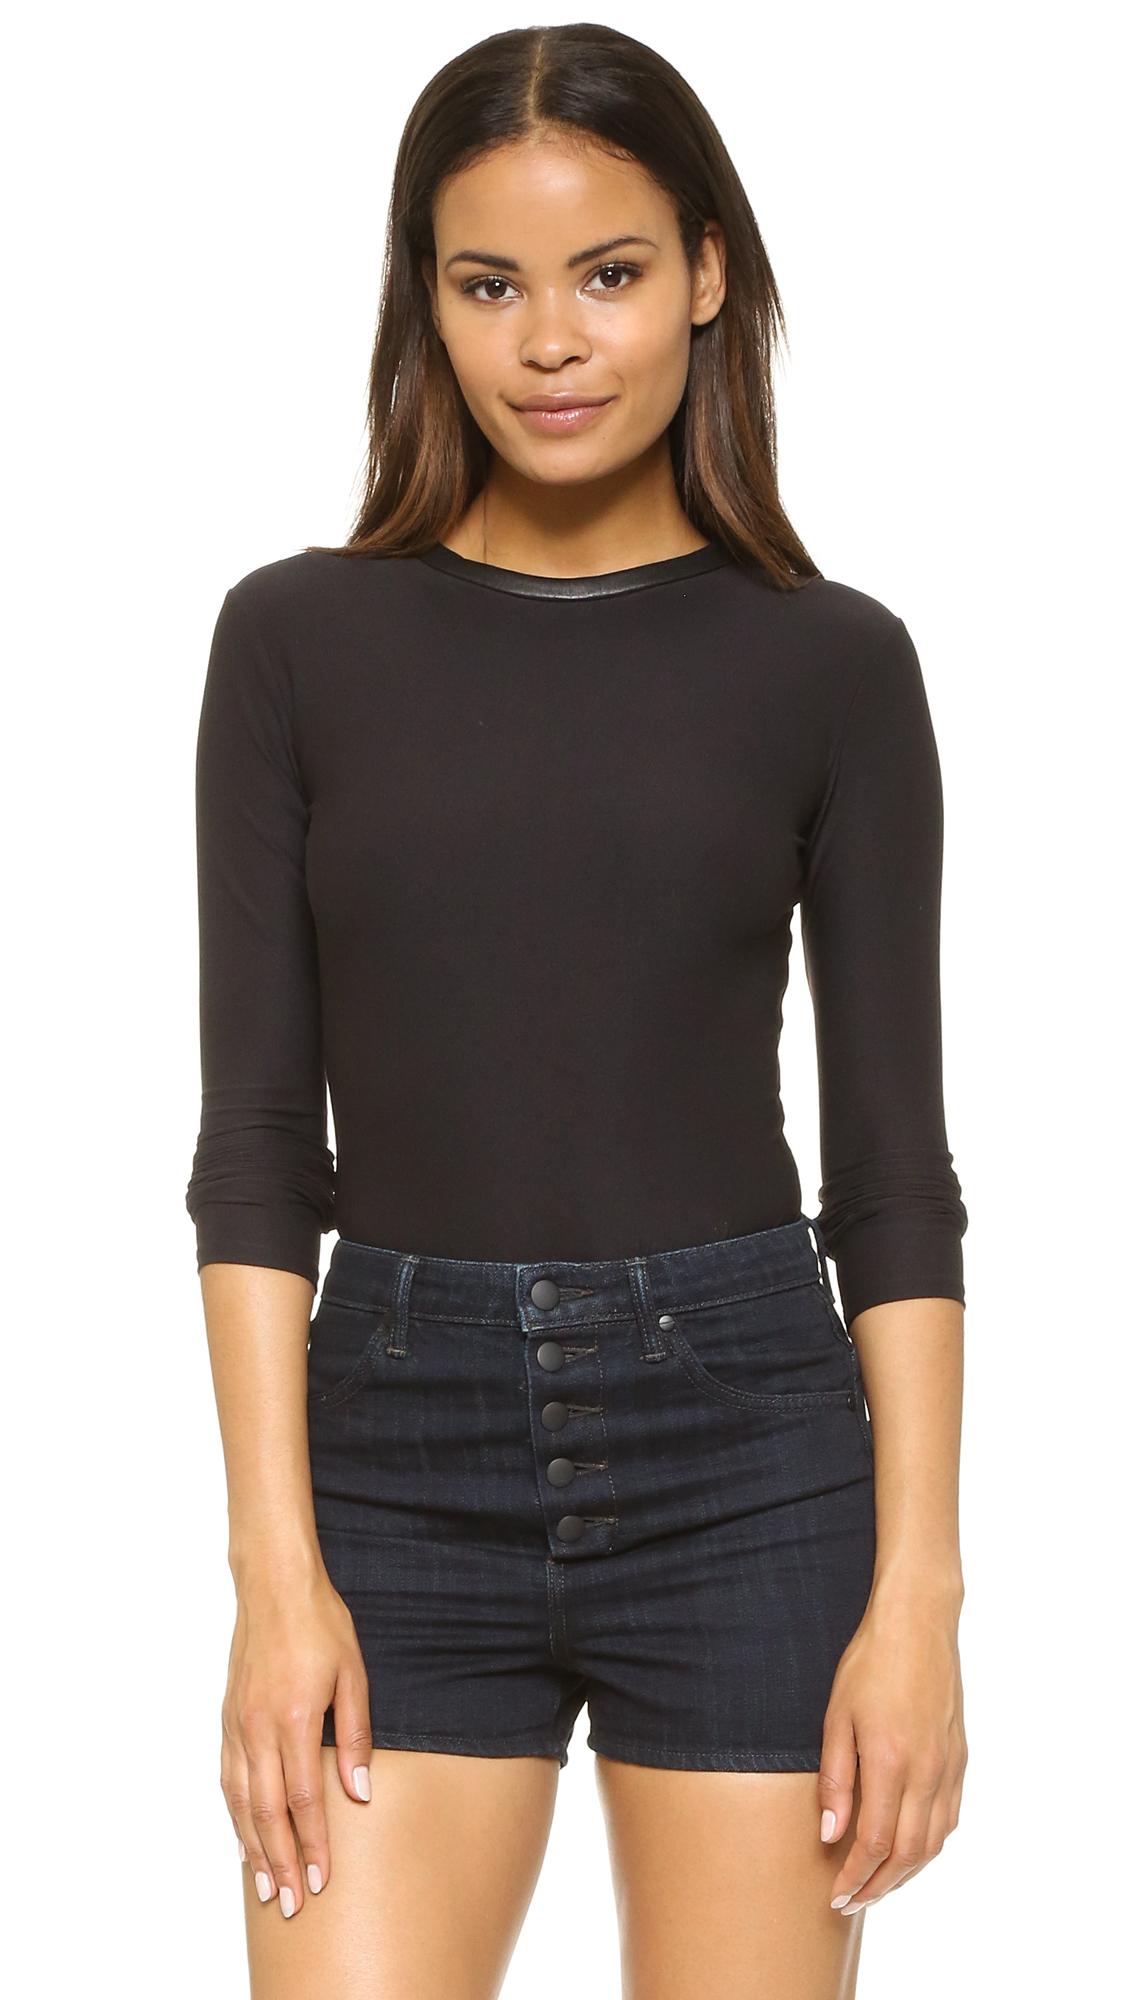 Alix Classic Collection Chloe Thong Bodysuit - Black/Black at Shopbop